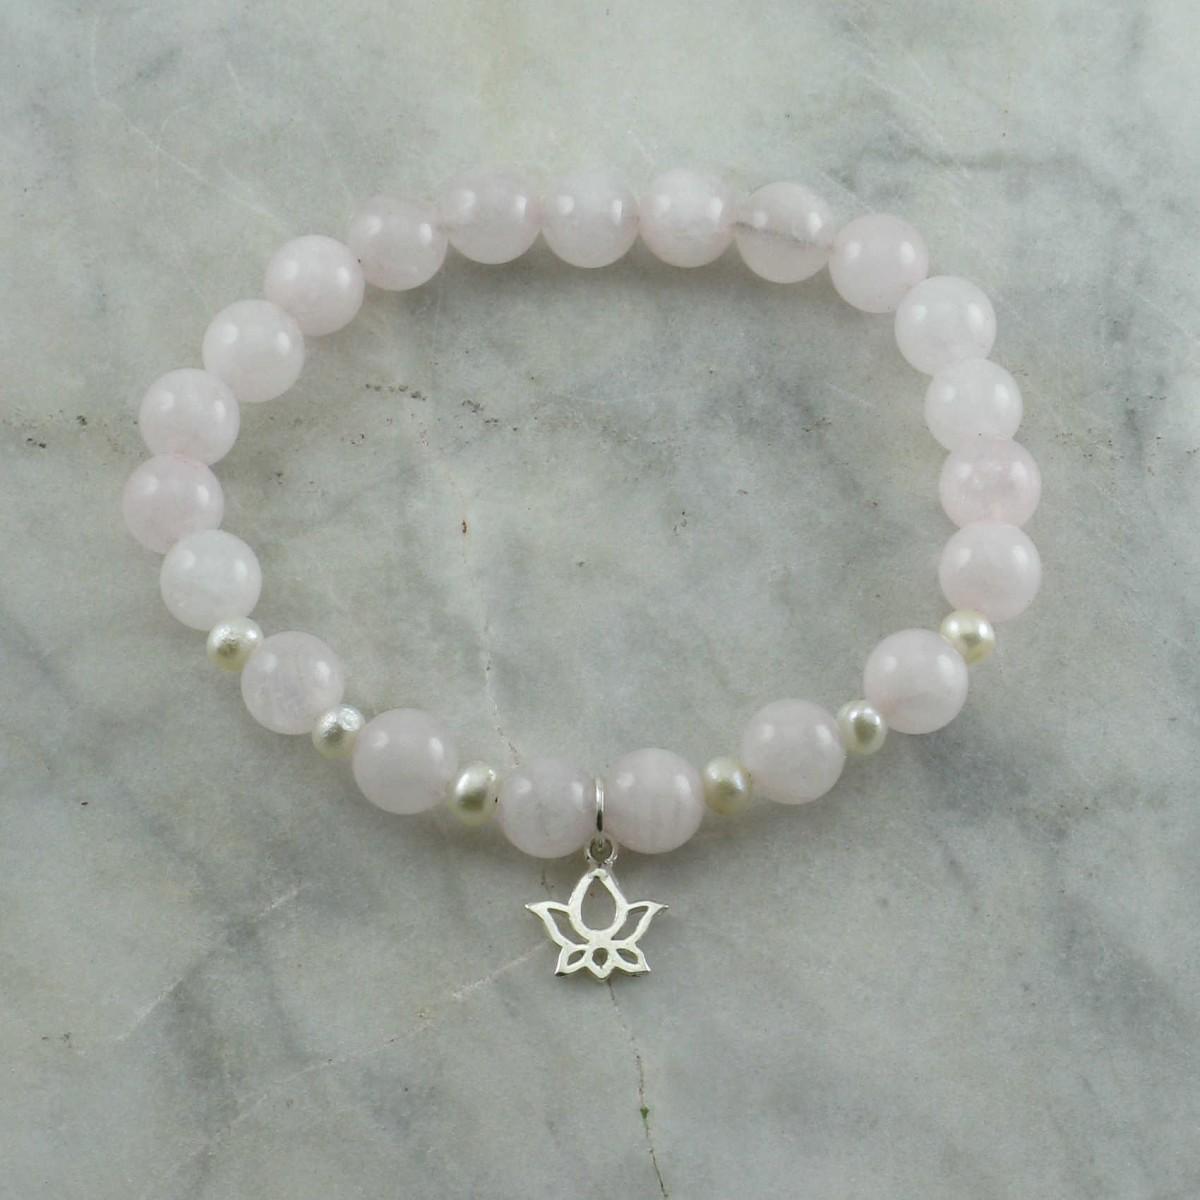 Lotus_Mala_Bracelet_21_Rose_Quartz_Mala_Beads_Buddhist_Bracelet